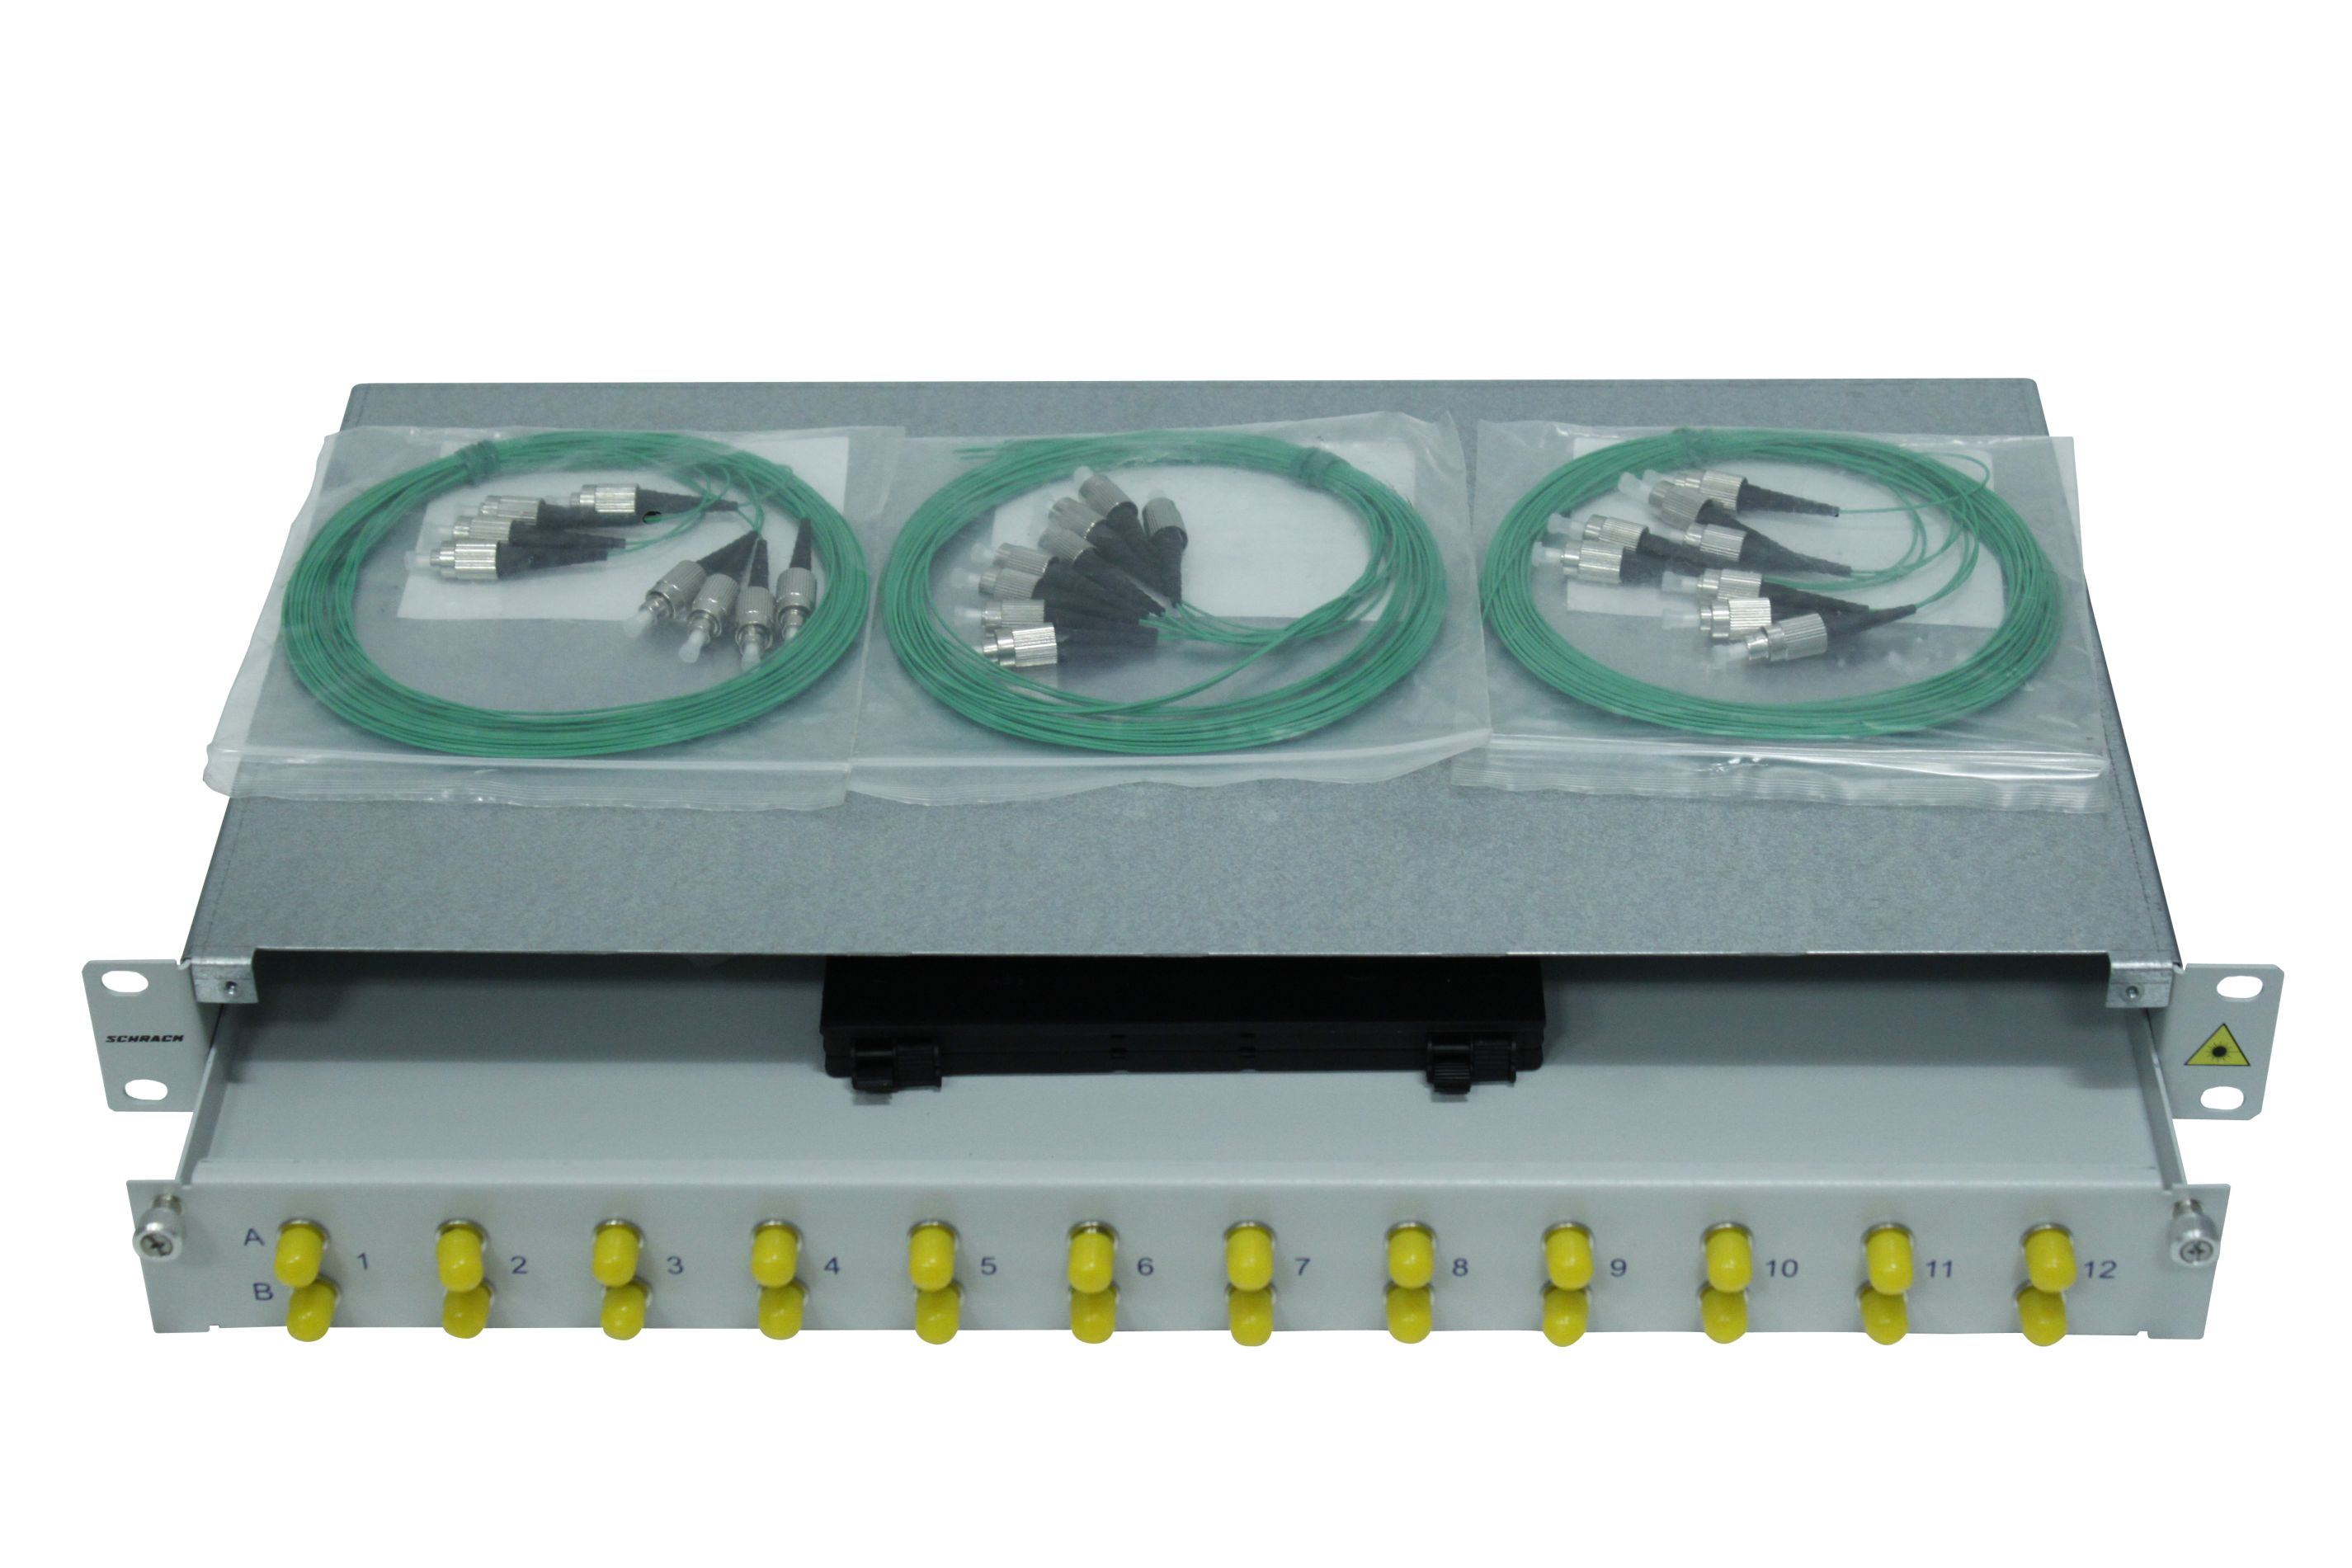 1 Stk LWL Spleißbox,16Fasern,FC, 9/125µm OS2, ausziehbar,19,1HE HSELS169FG